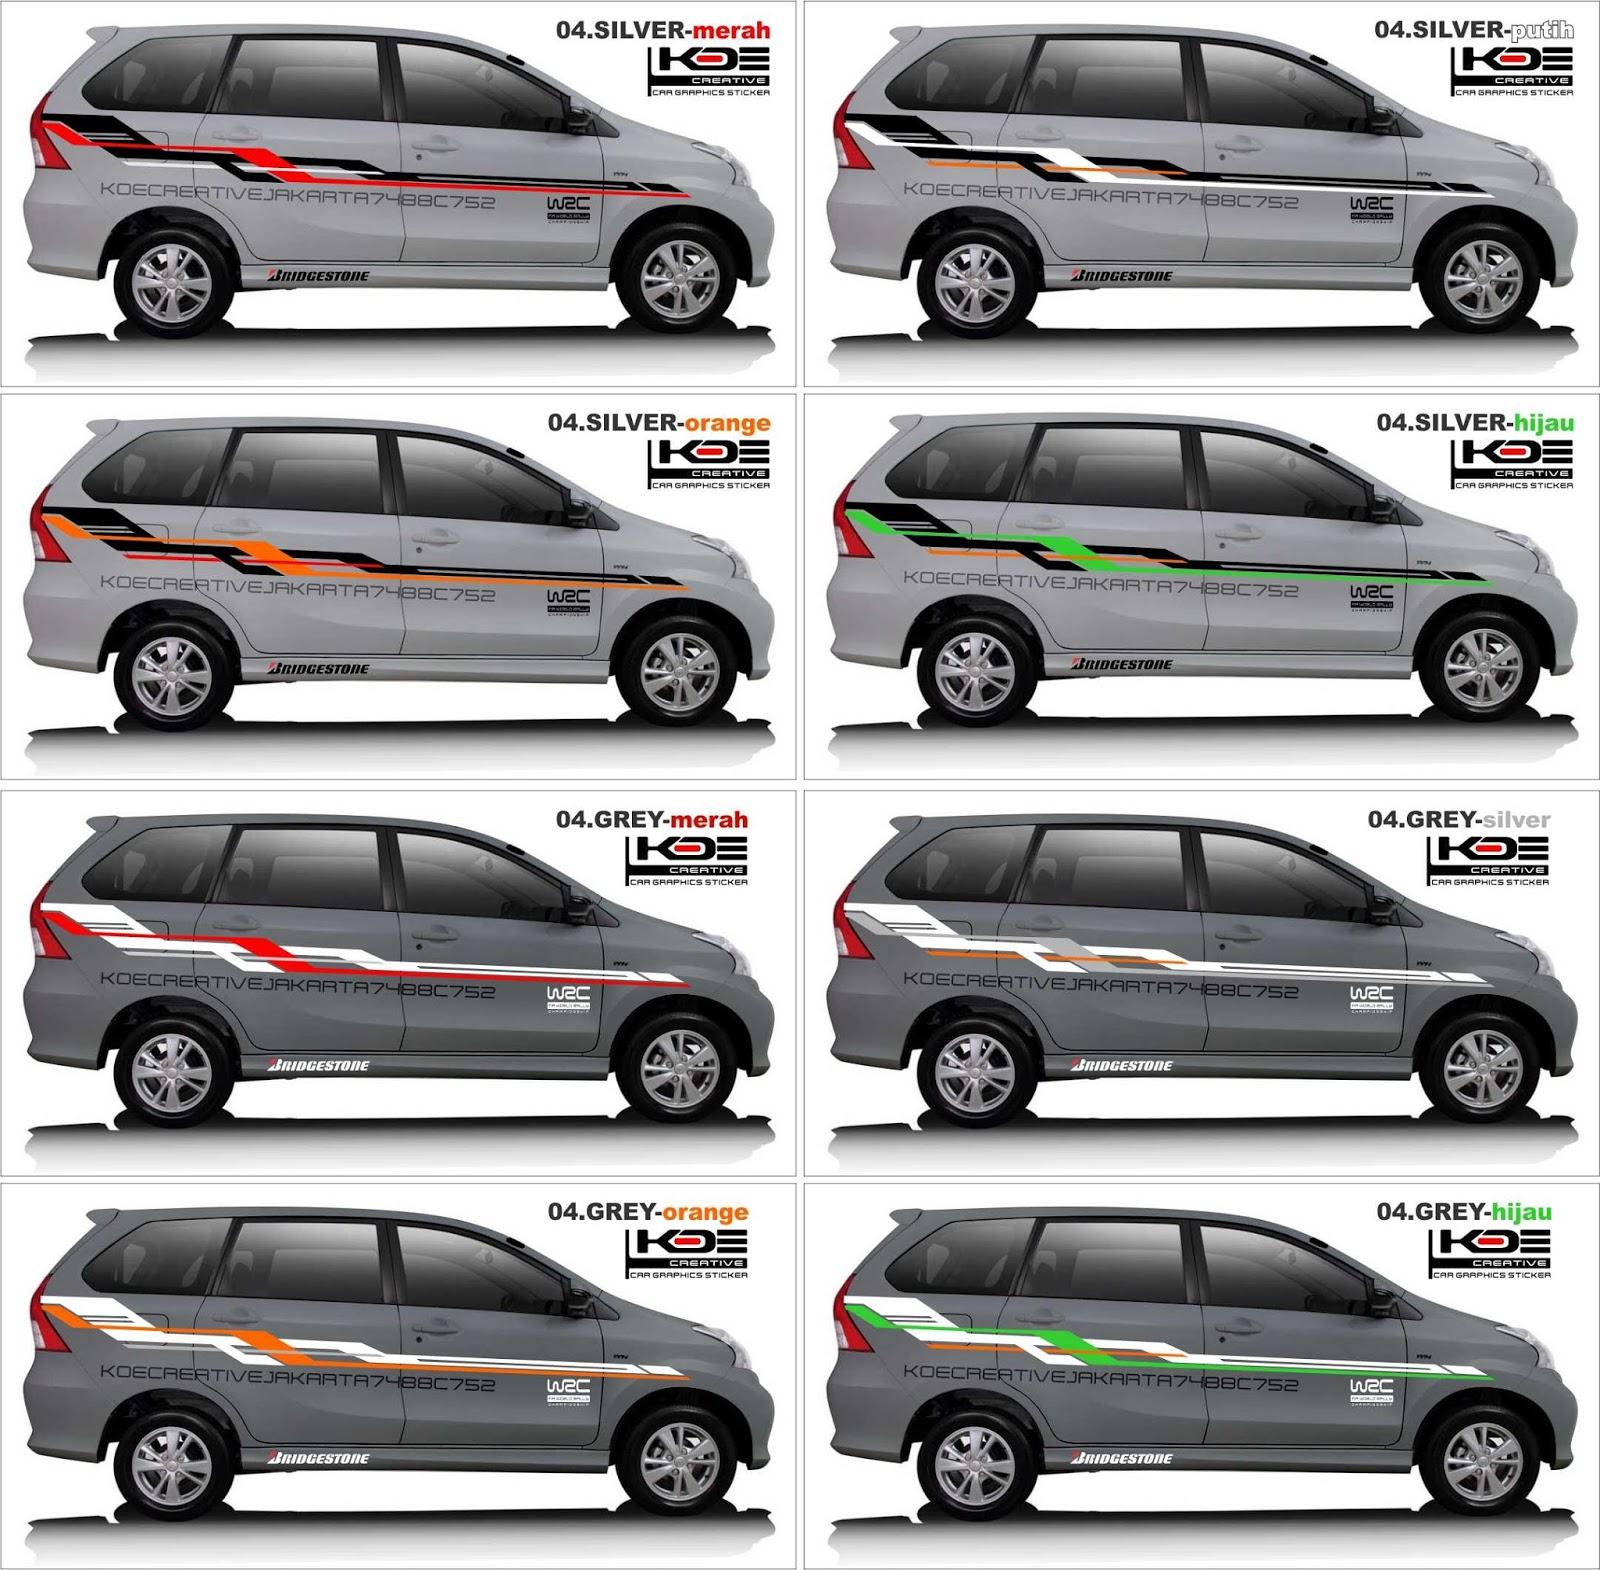 960+ Gambar Mobil Avanza Warna Grey Terbaru